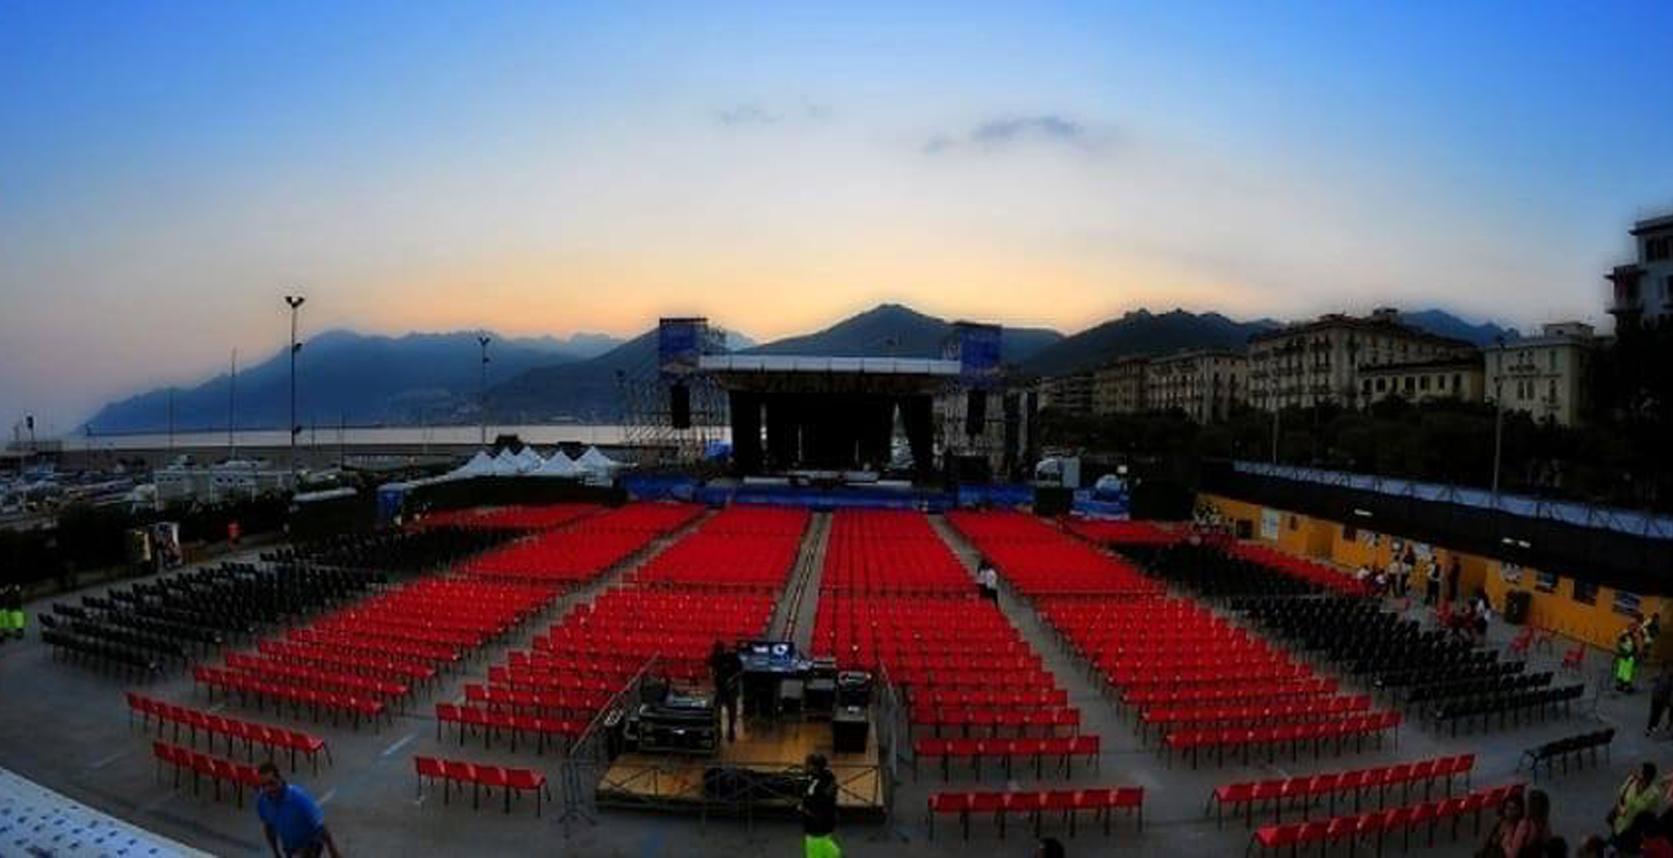 PINK FLOYD LEGEND TOUR 2020